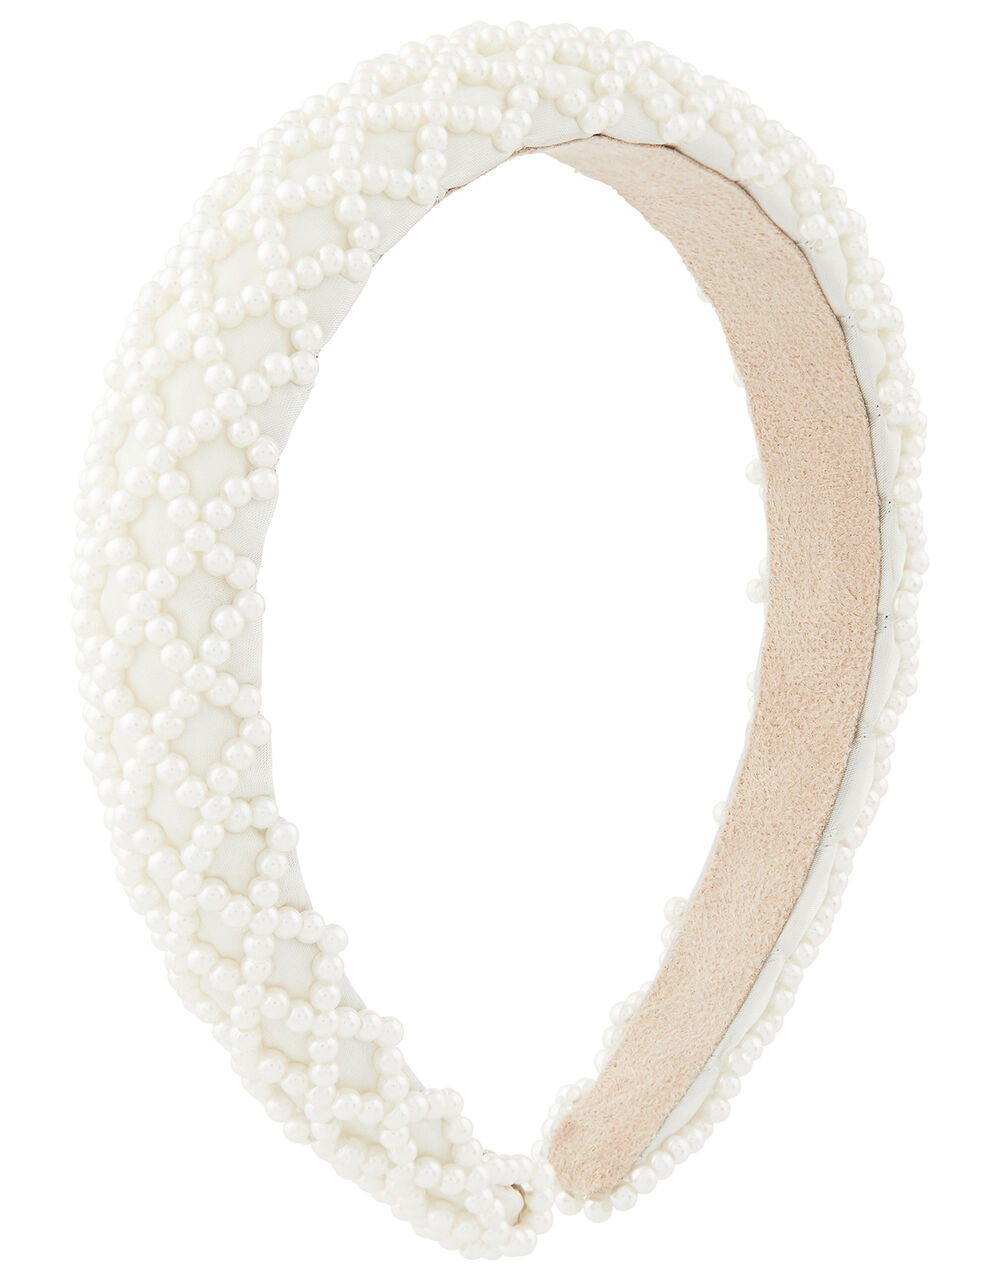 Padded Pearly Criss-Cross Headband, , large